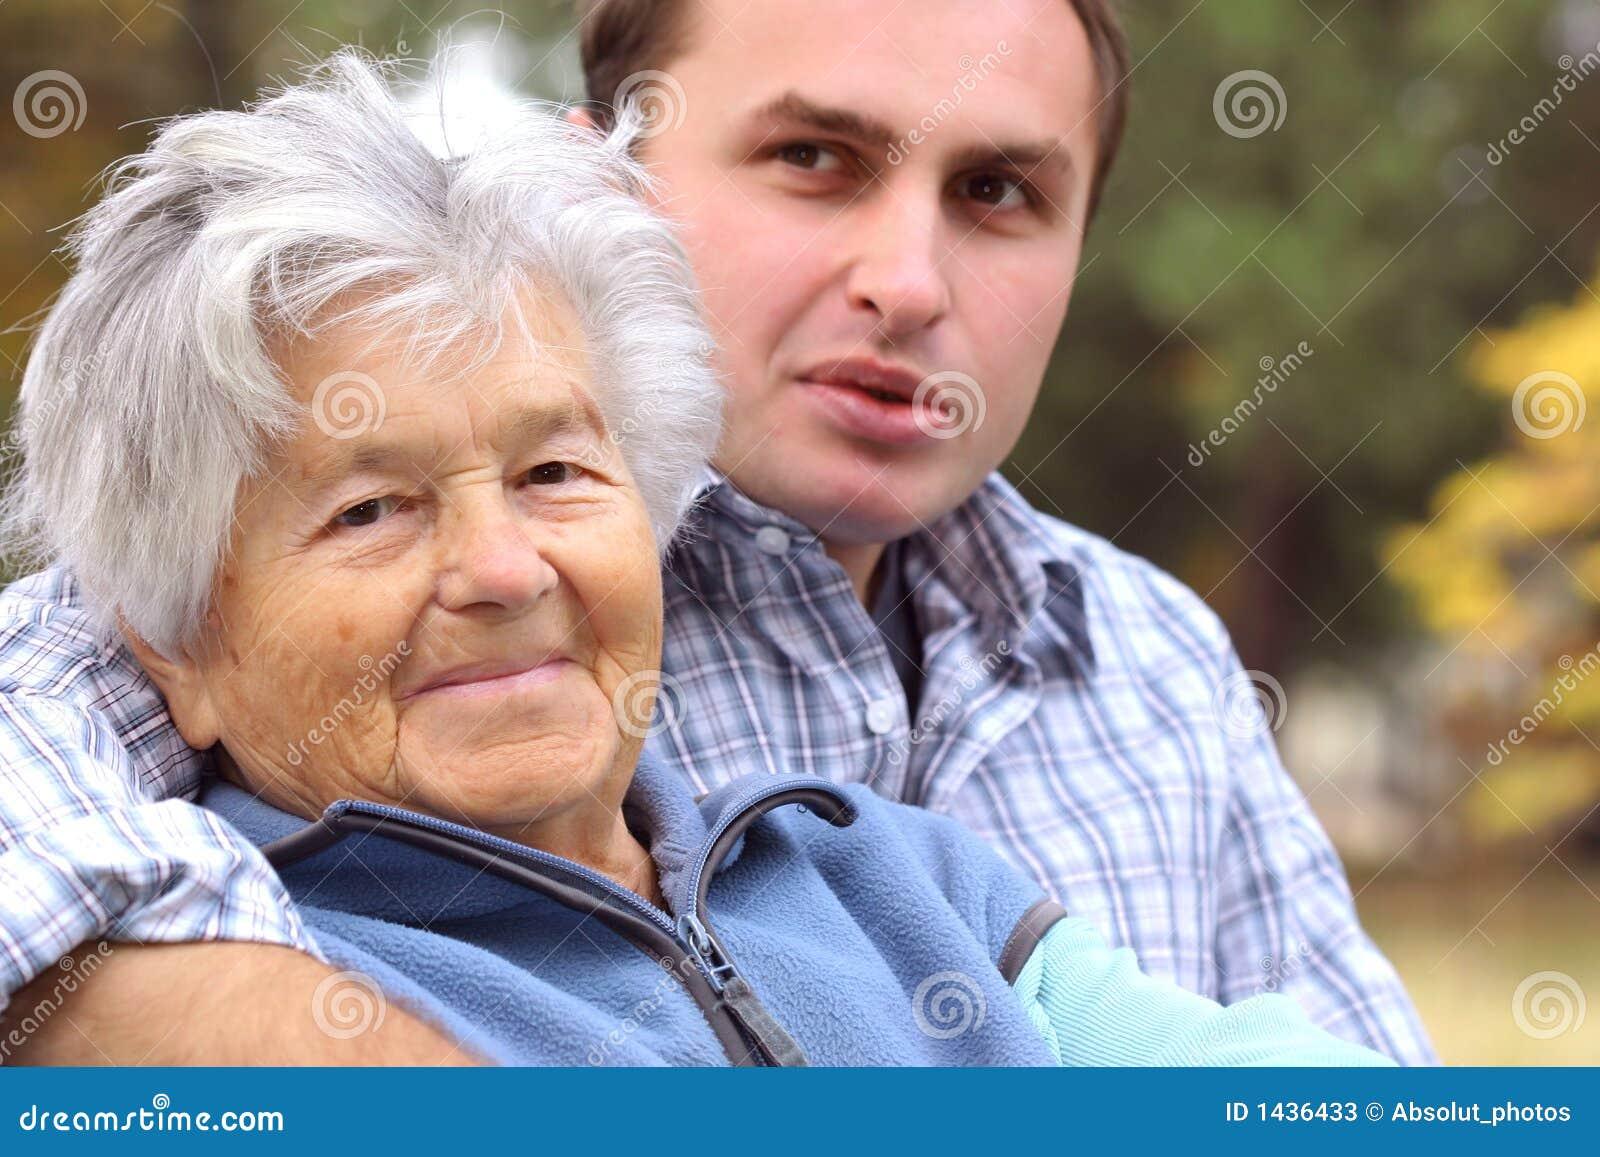 Wenn ältere Frauen junge Männer lieben